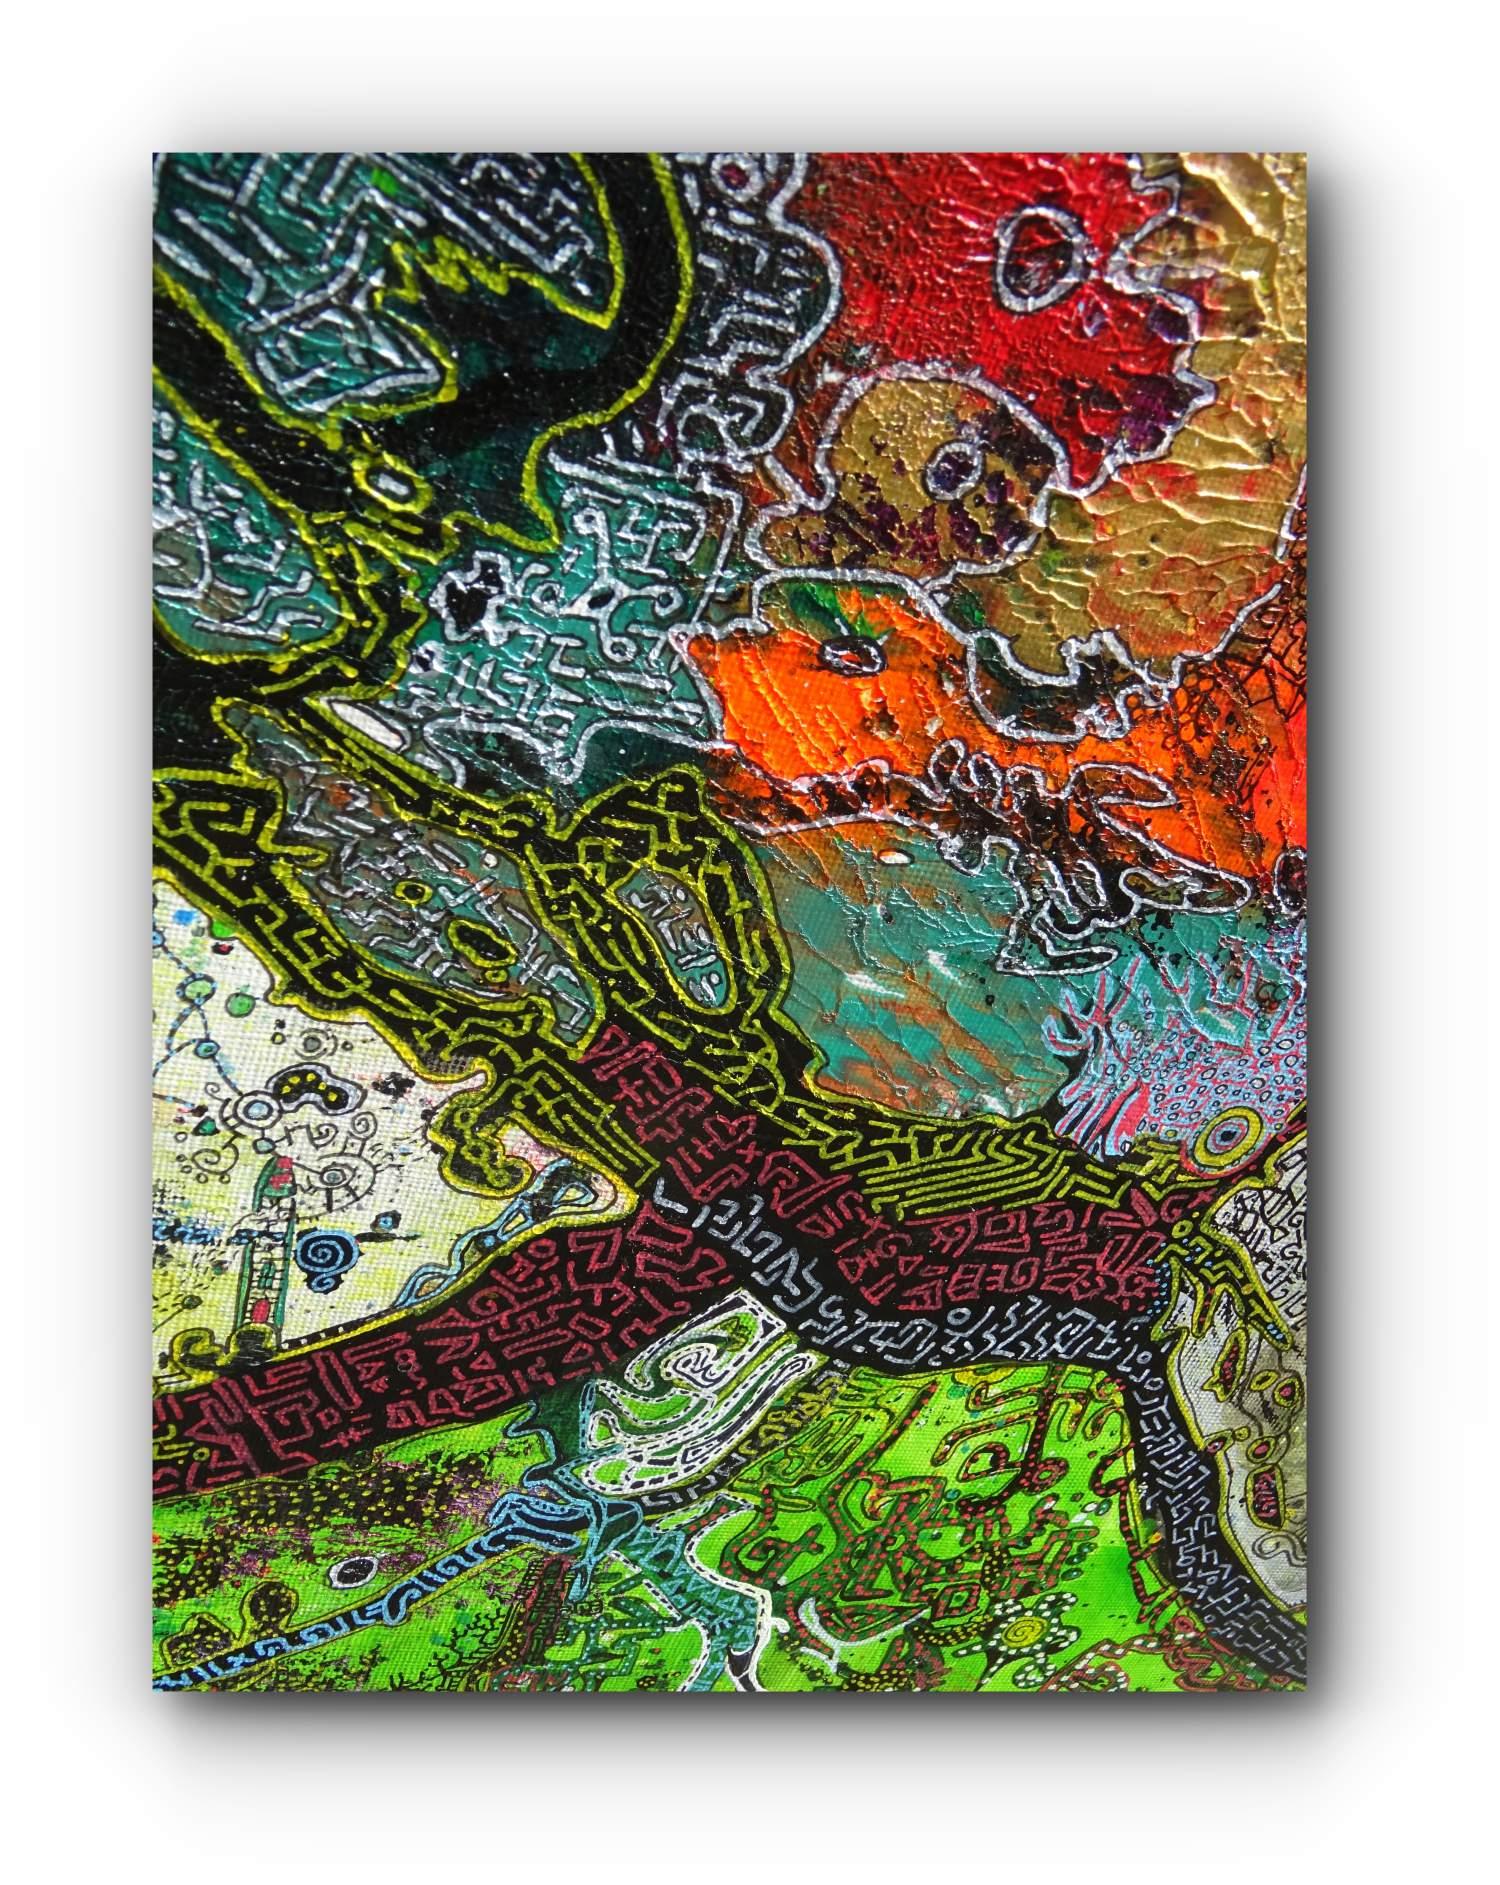 painting-detail-11-ground-control-artists-ingress-vortices.jpg